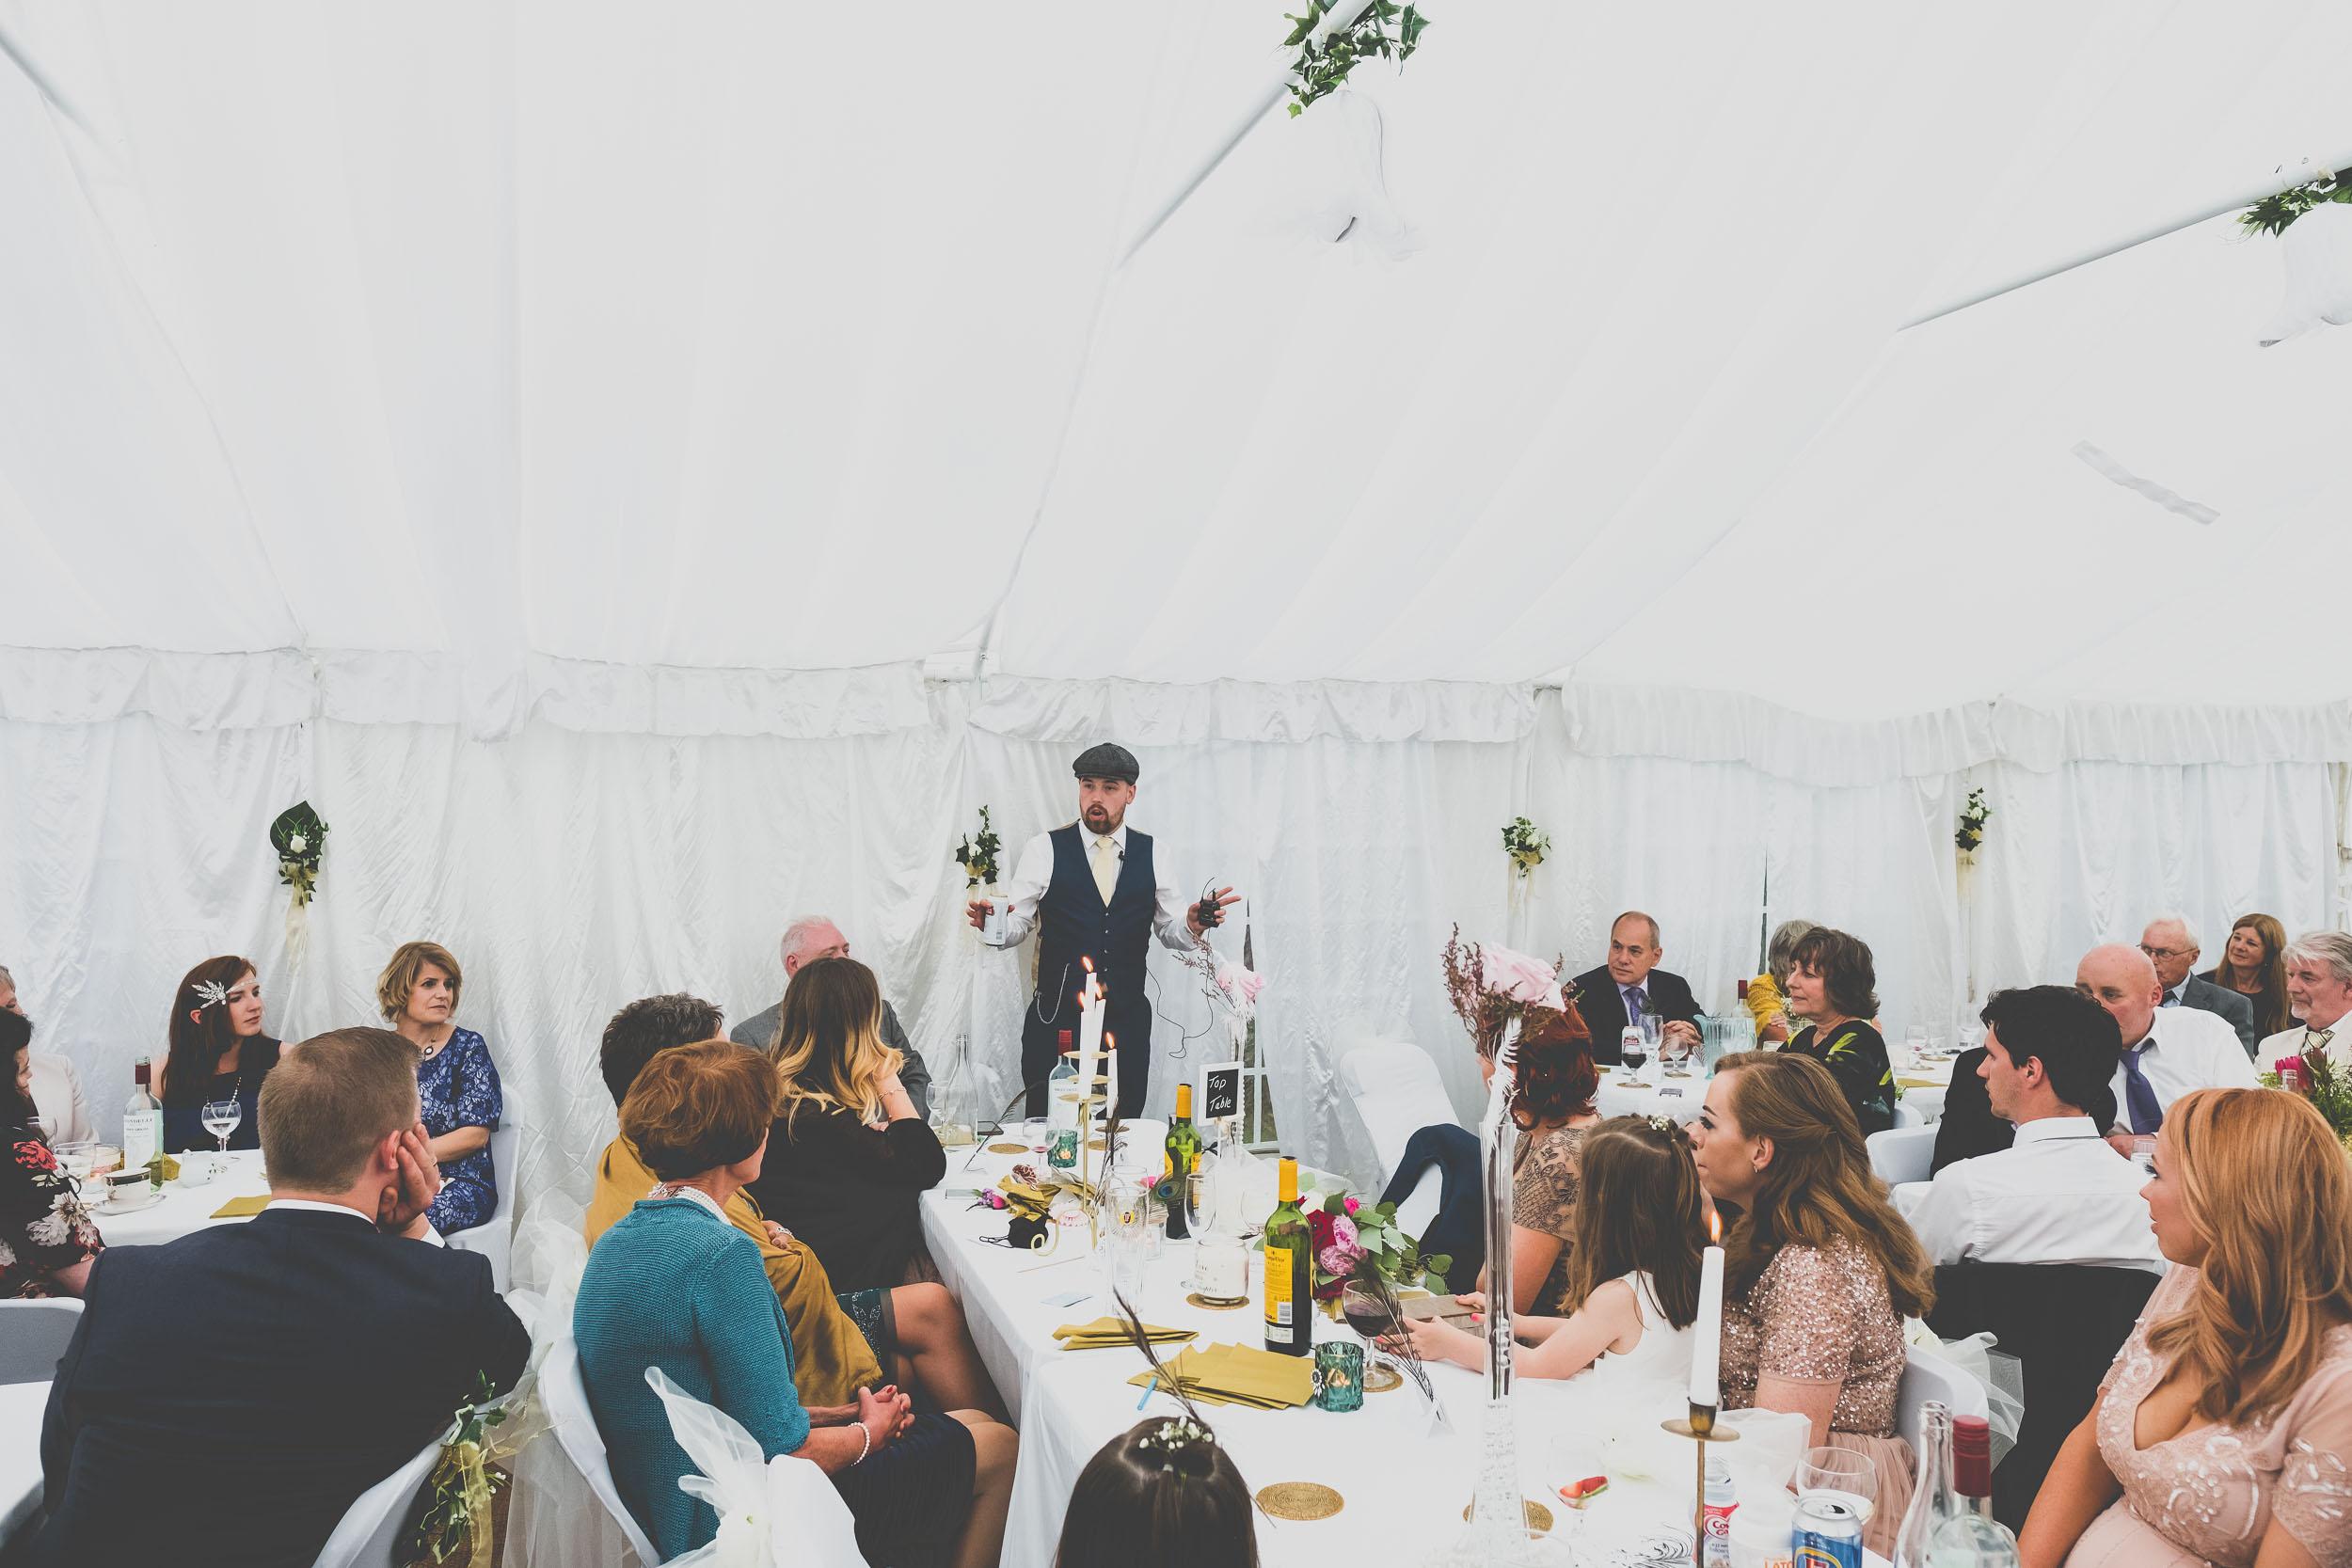 queen-elizabeths-hunting-lodge-epping-forest-wedding344.jpg